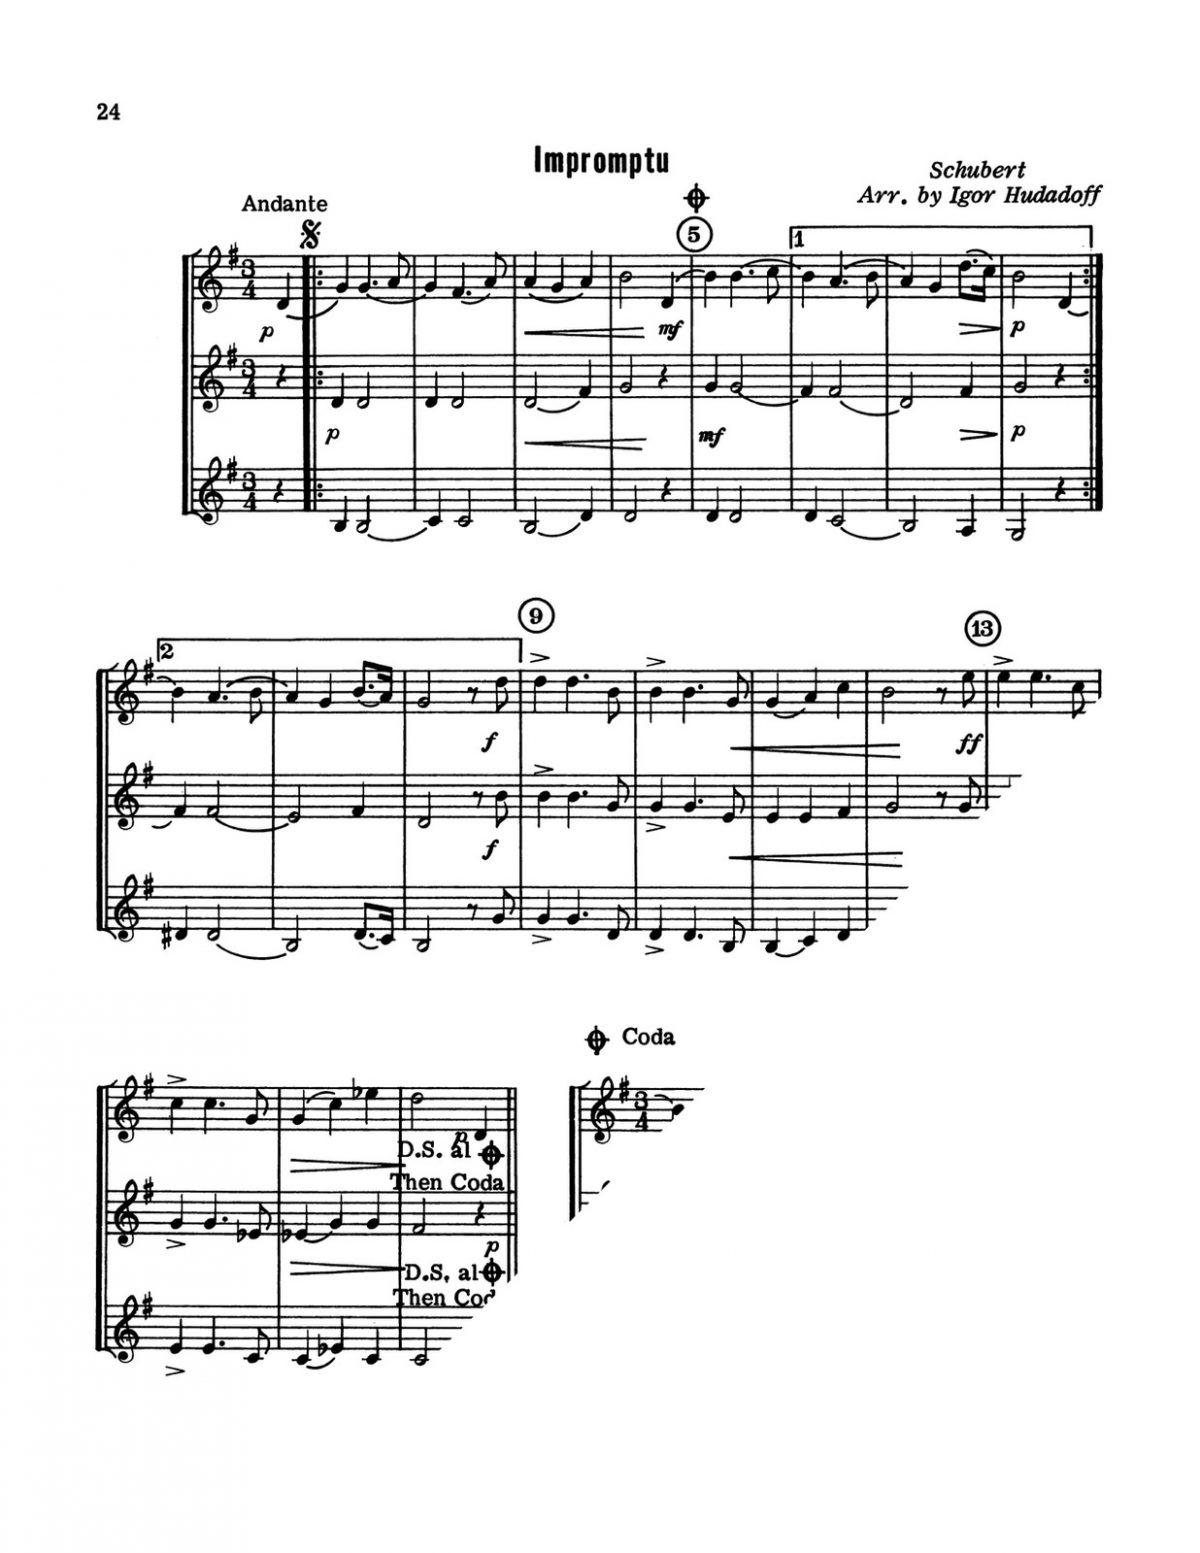 Hudadoff, 24 Trumpet Trios-p26